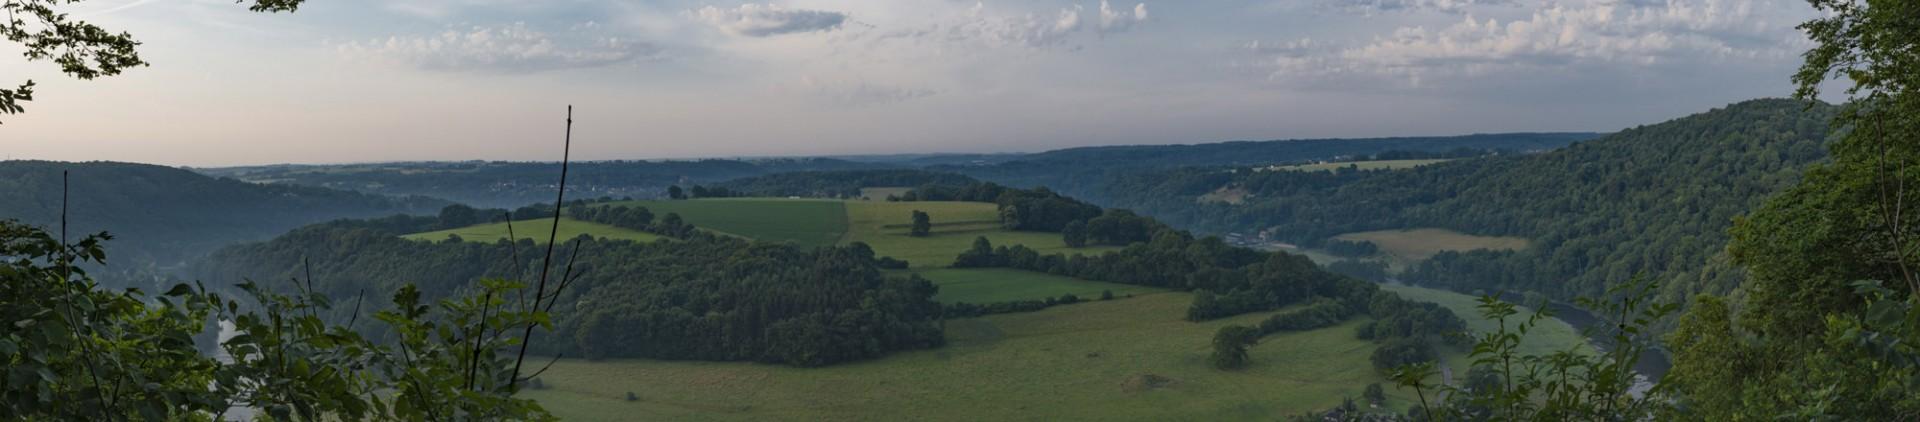 5 Panorama-Ideen - Provinz Lüttich